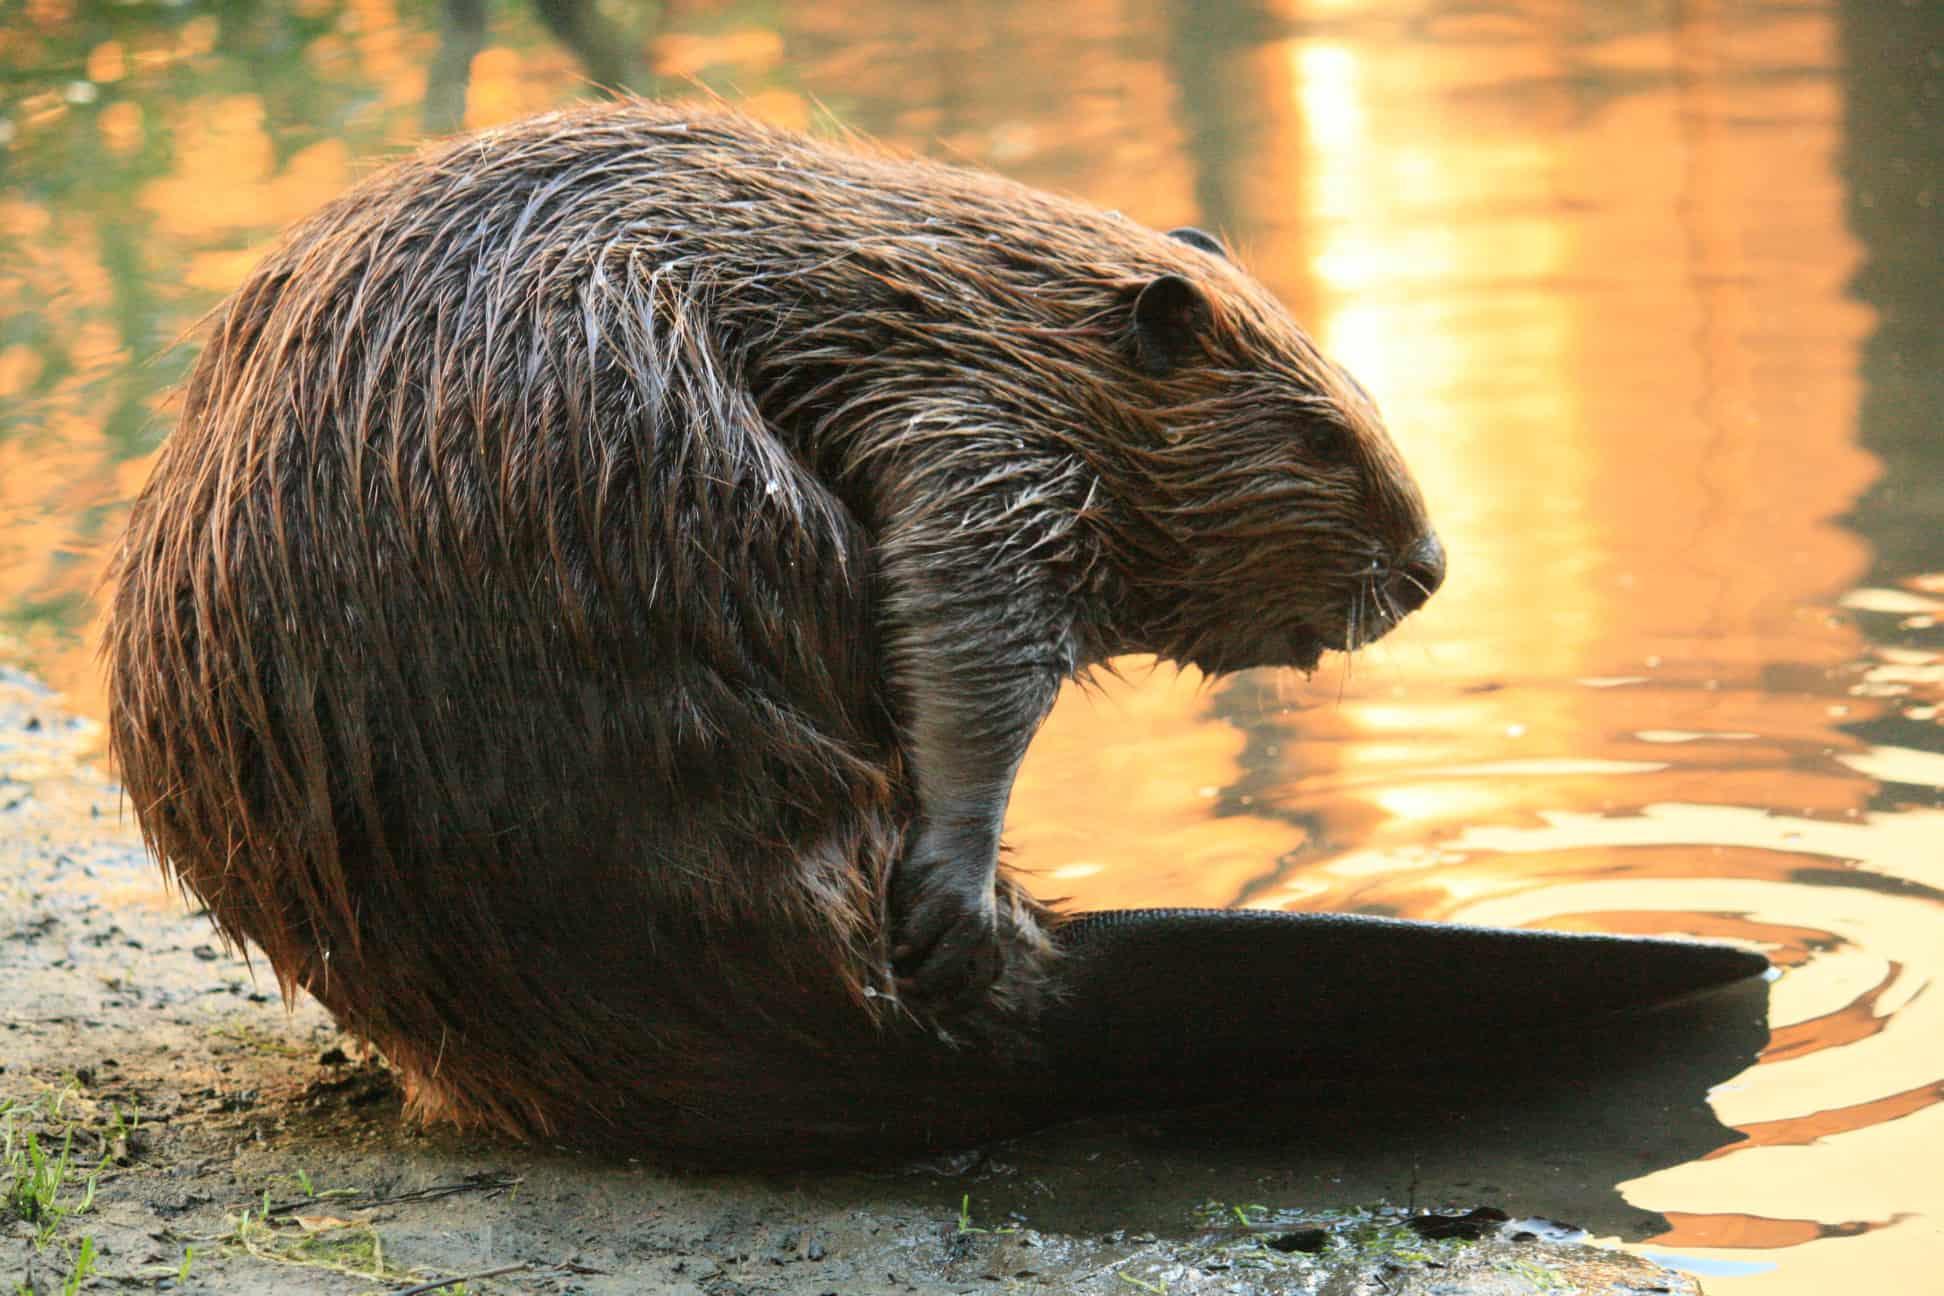 How big is a Beaver?